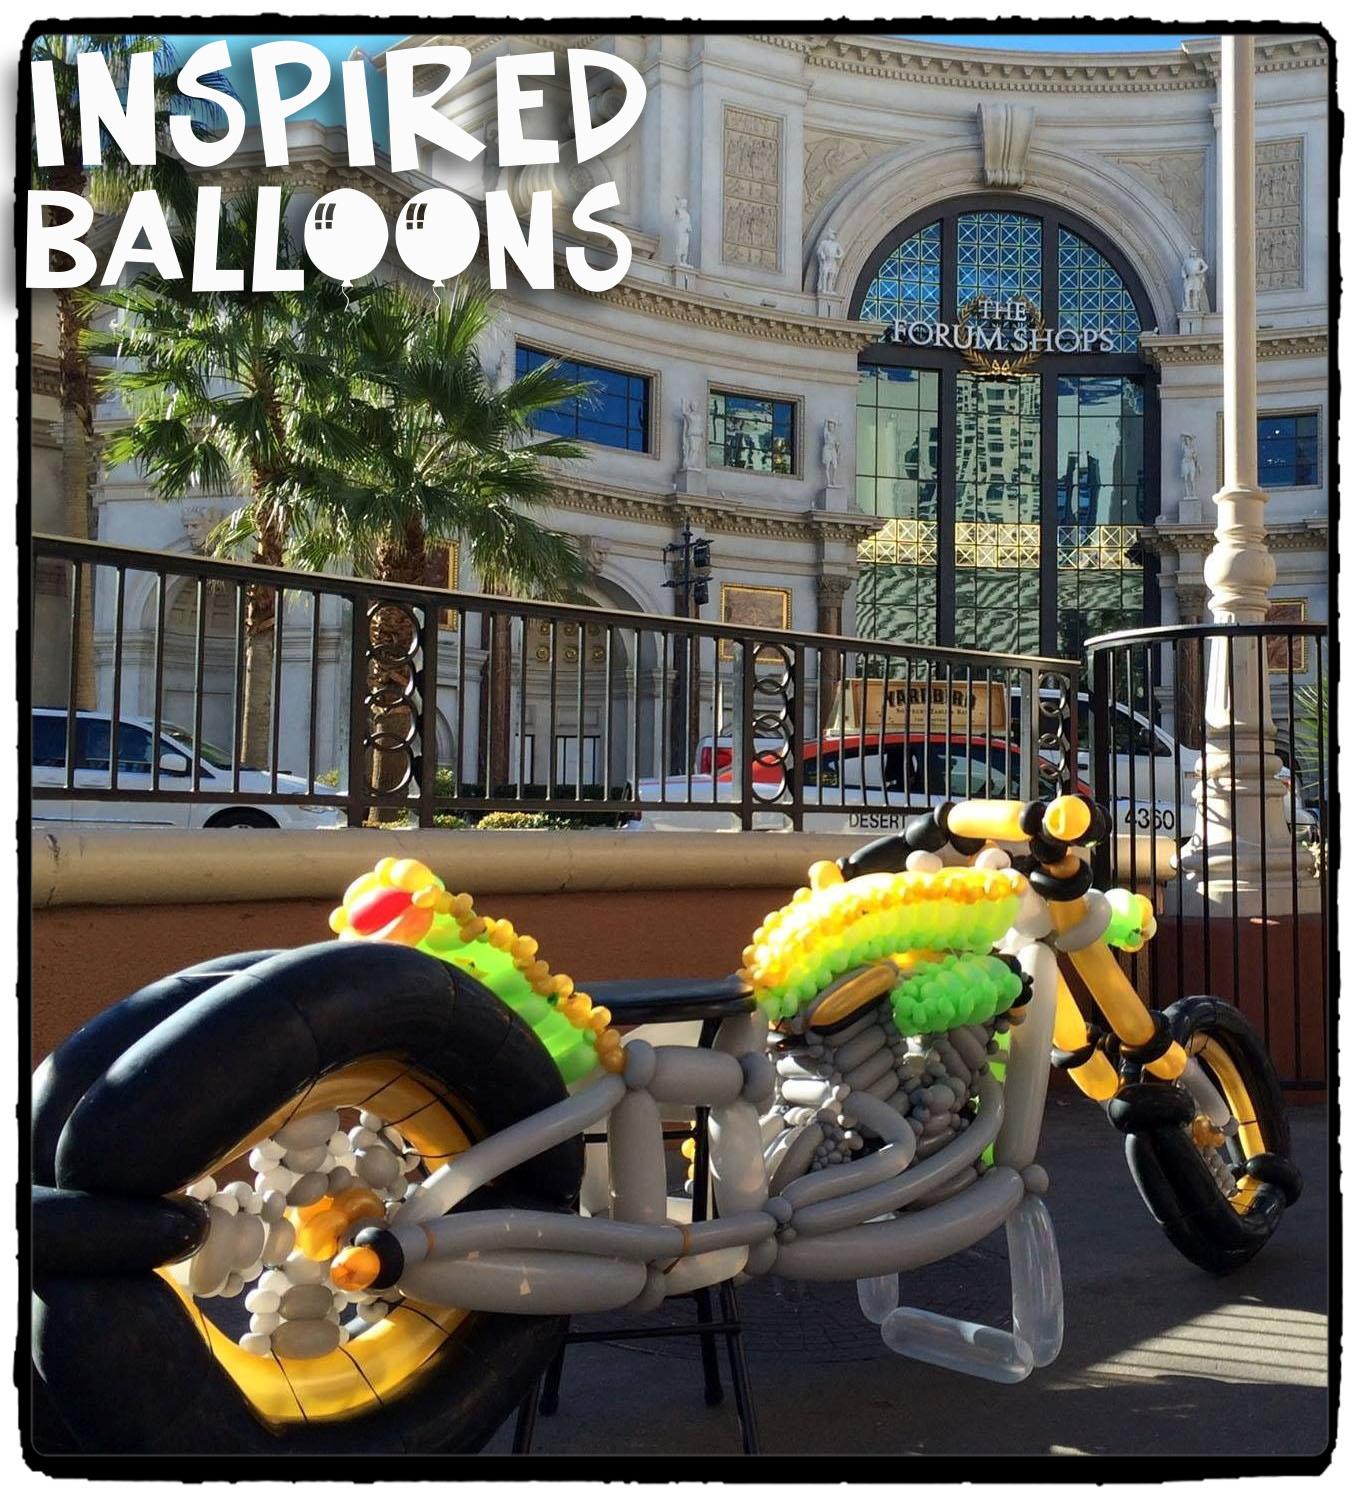 Twist & Shout Large Motocycle Build 2015